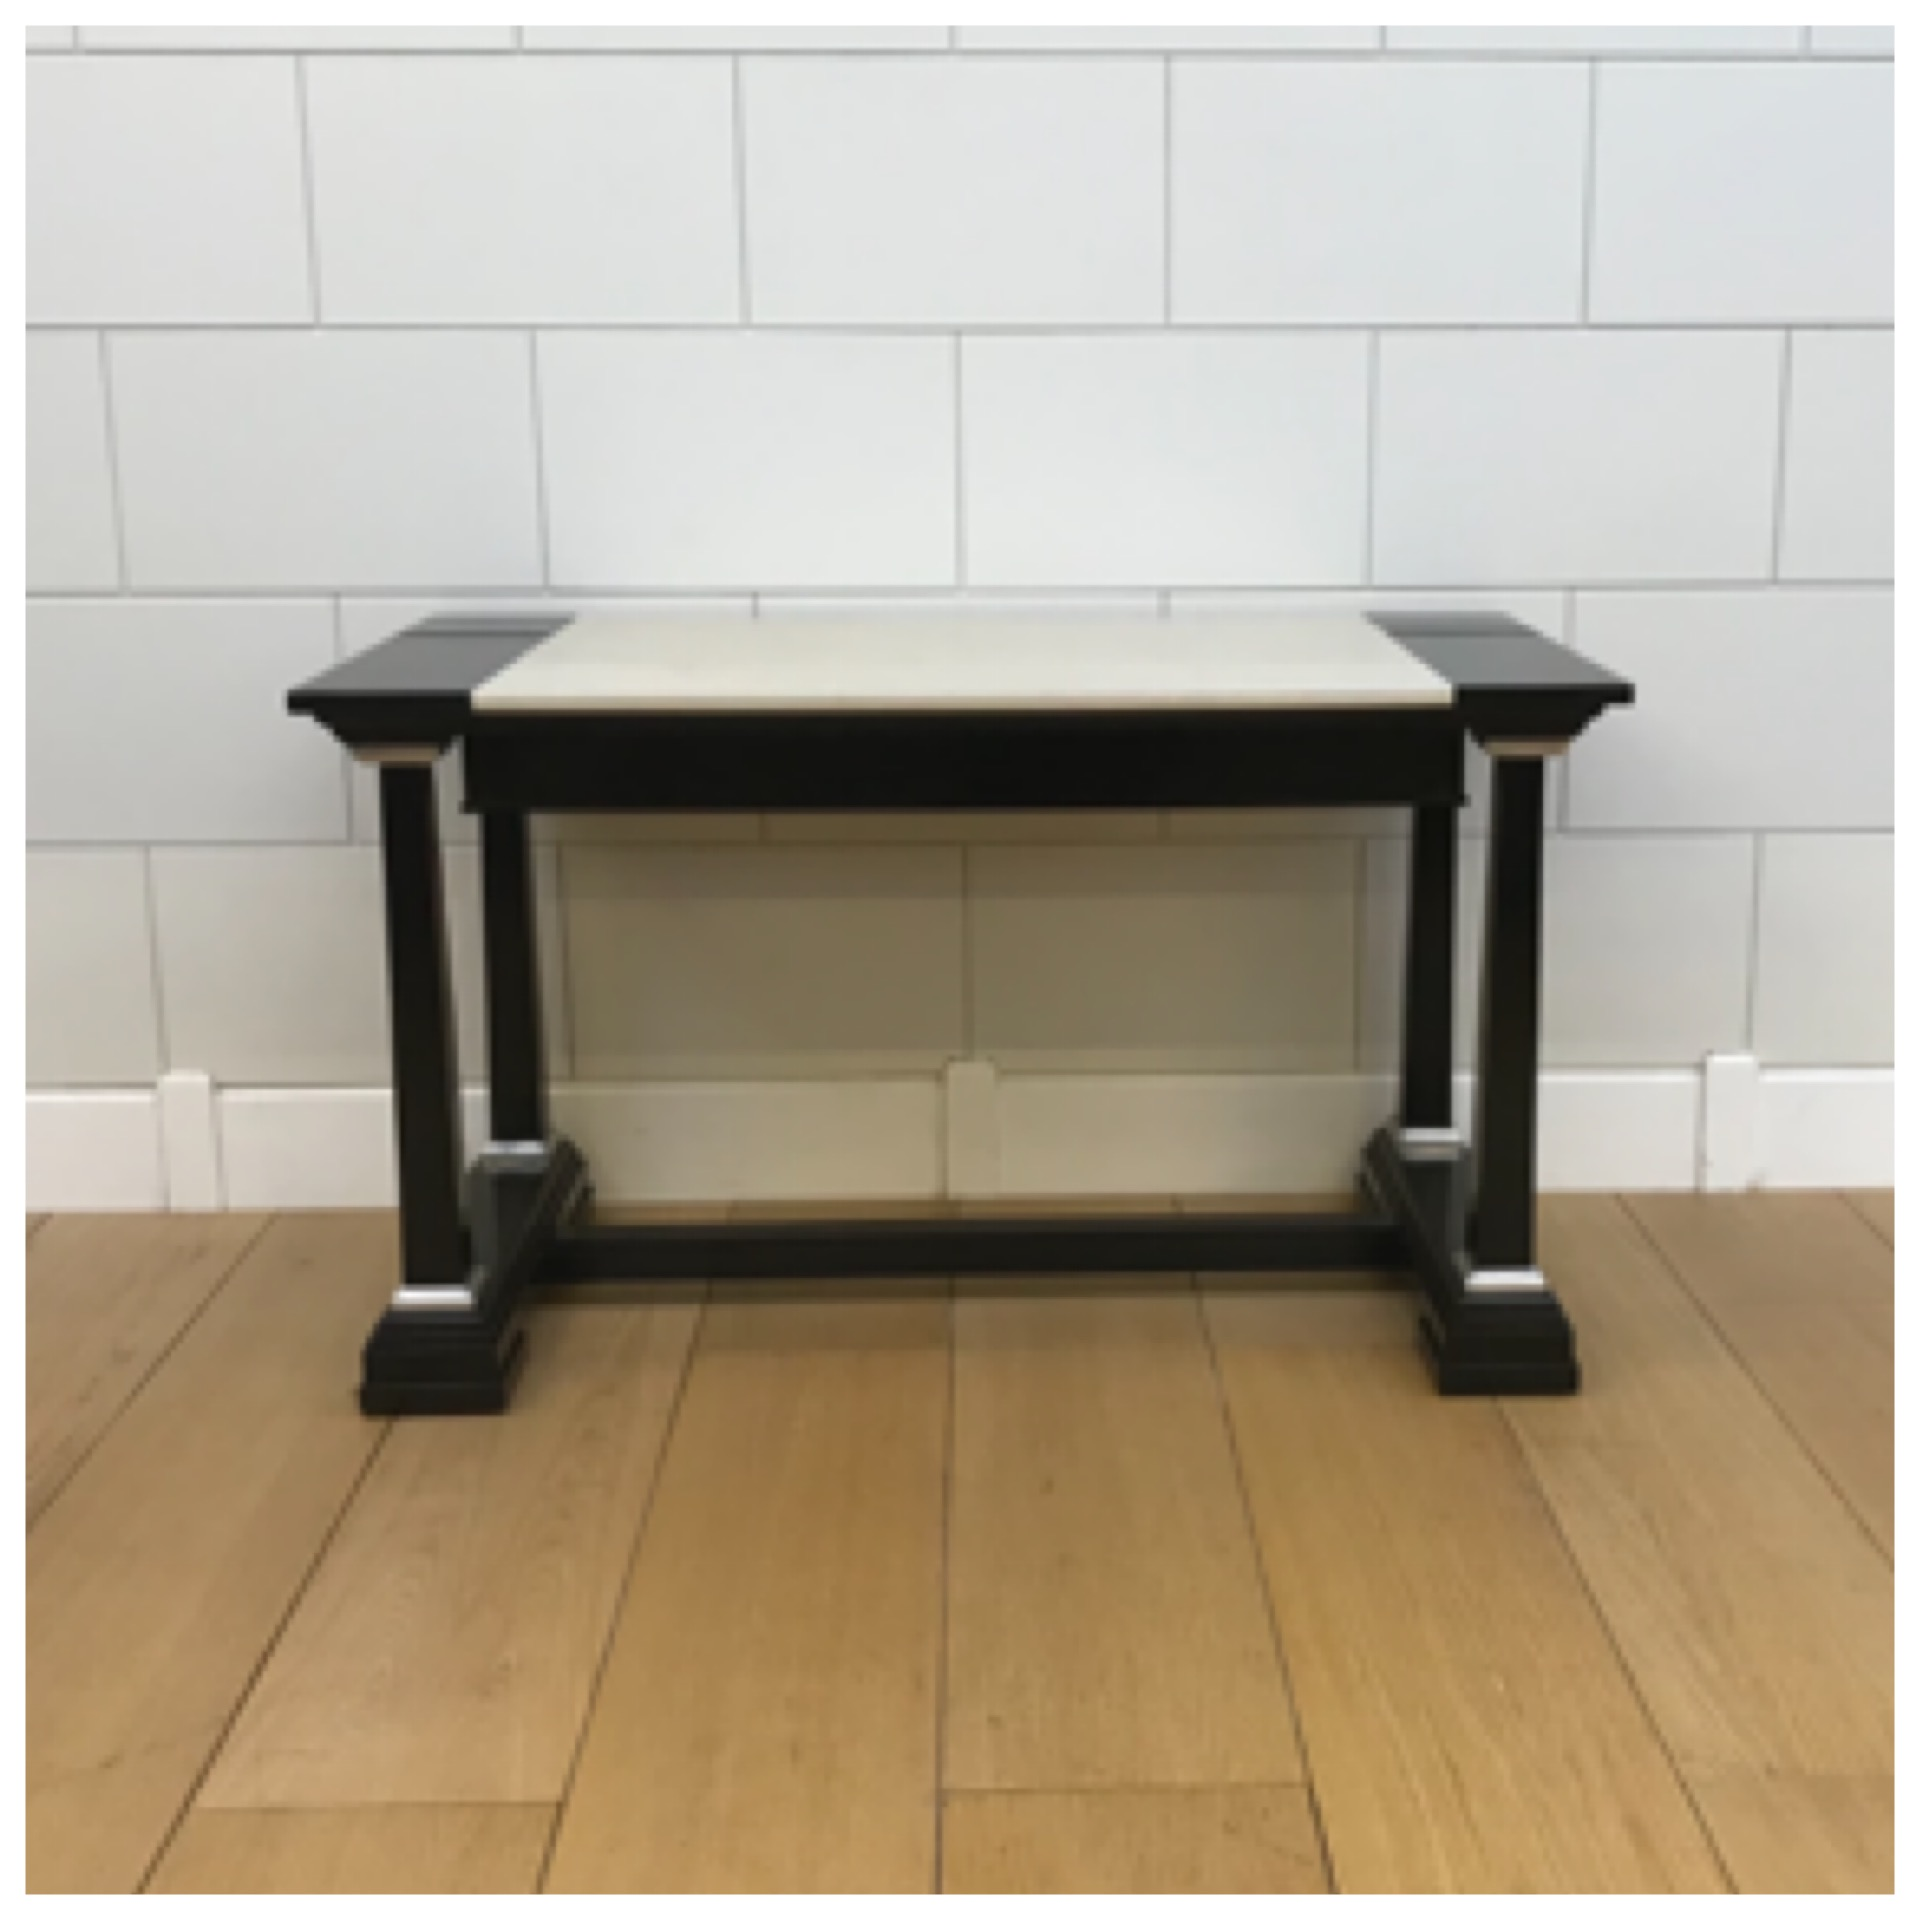 Sale Price: £620